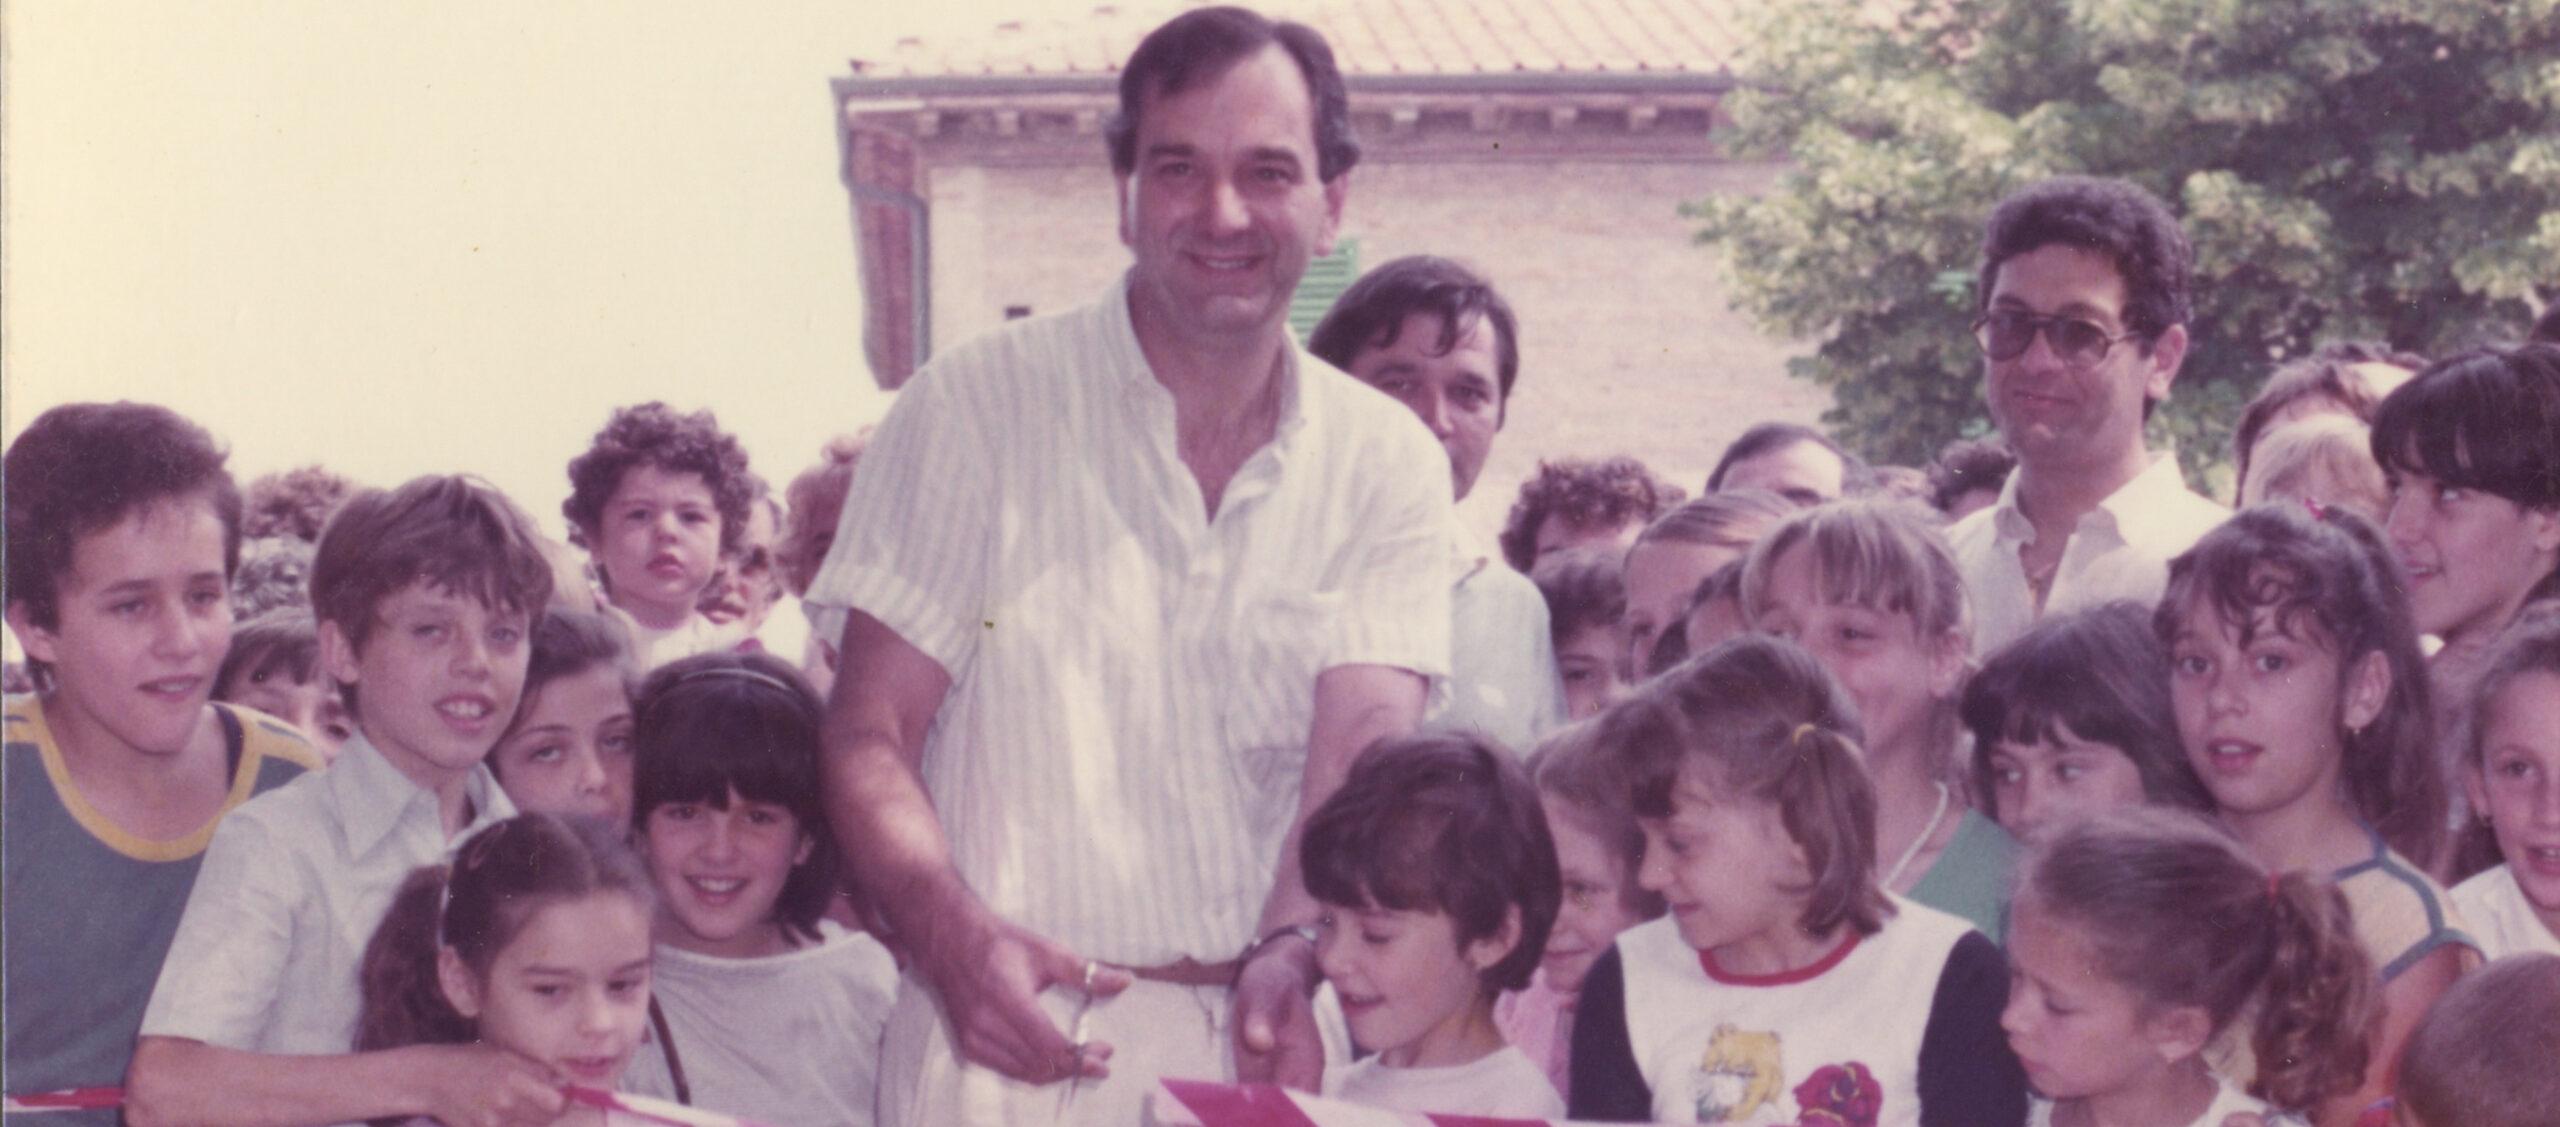 Loredano Bigazzi: un sindaco, un sindacalista, un uomo onesto